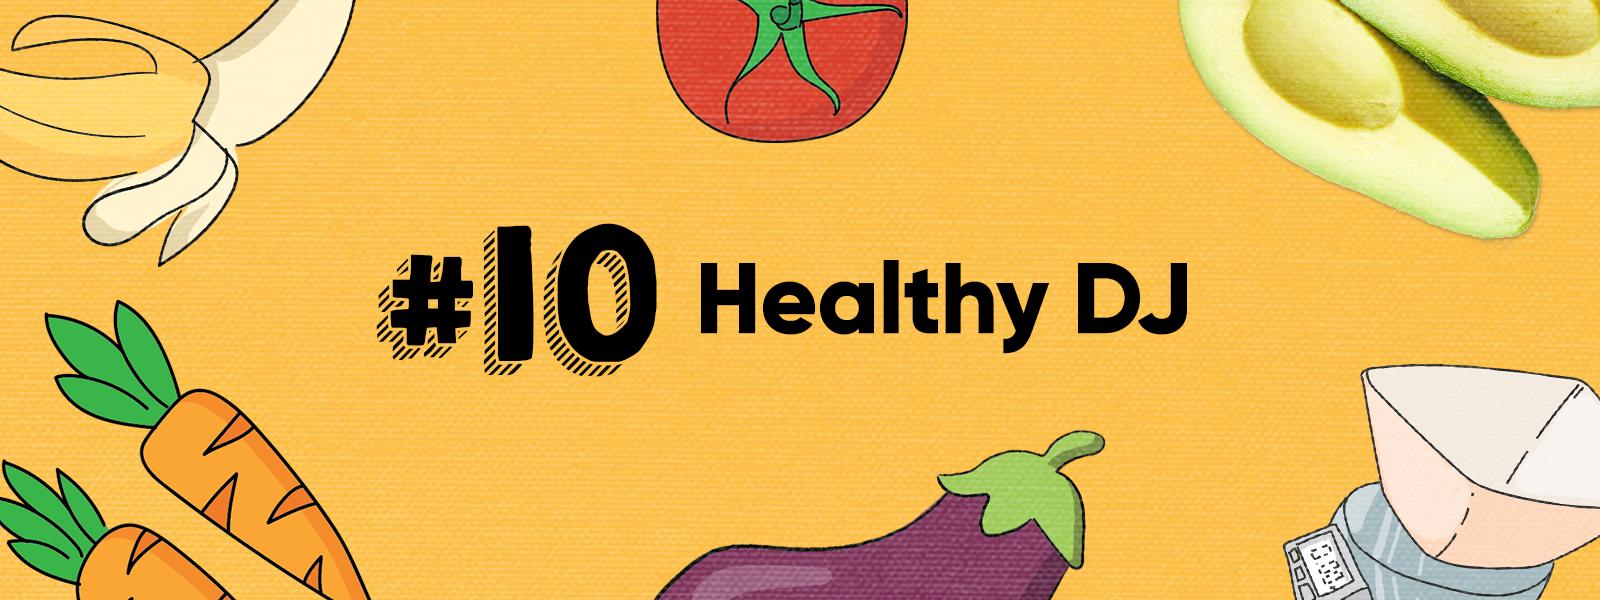 Skill 10: Healthy DJ